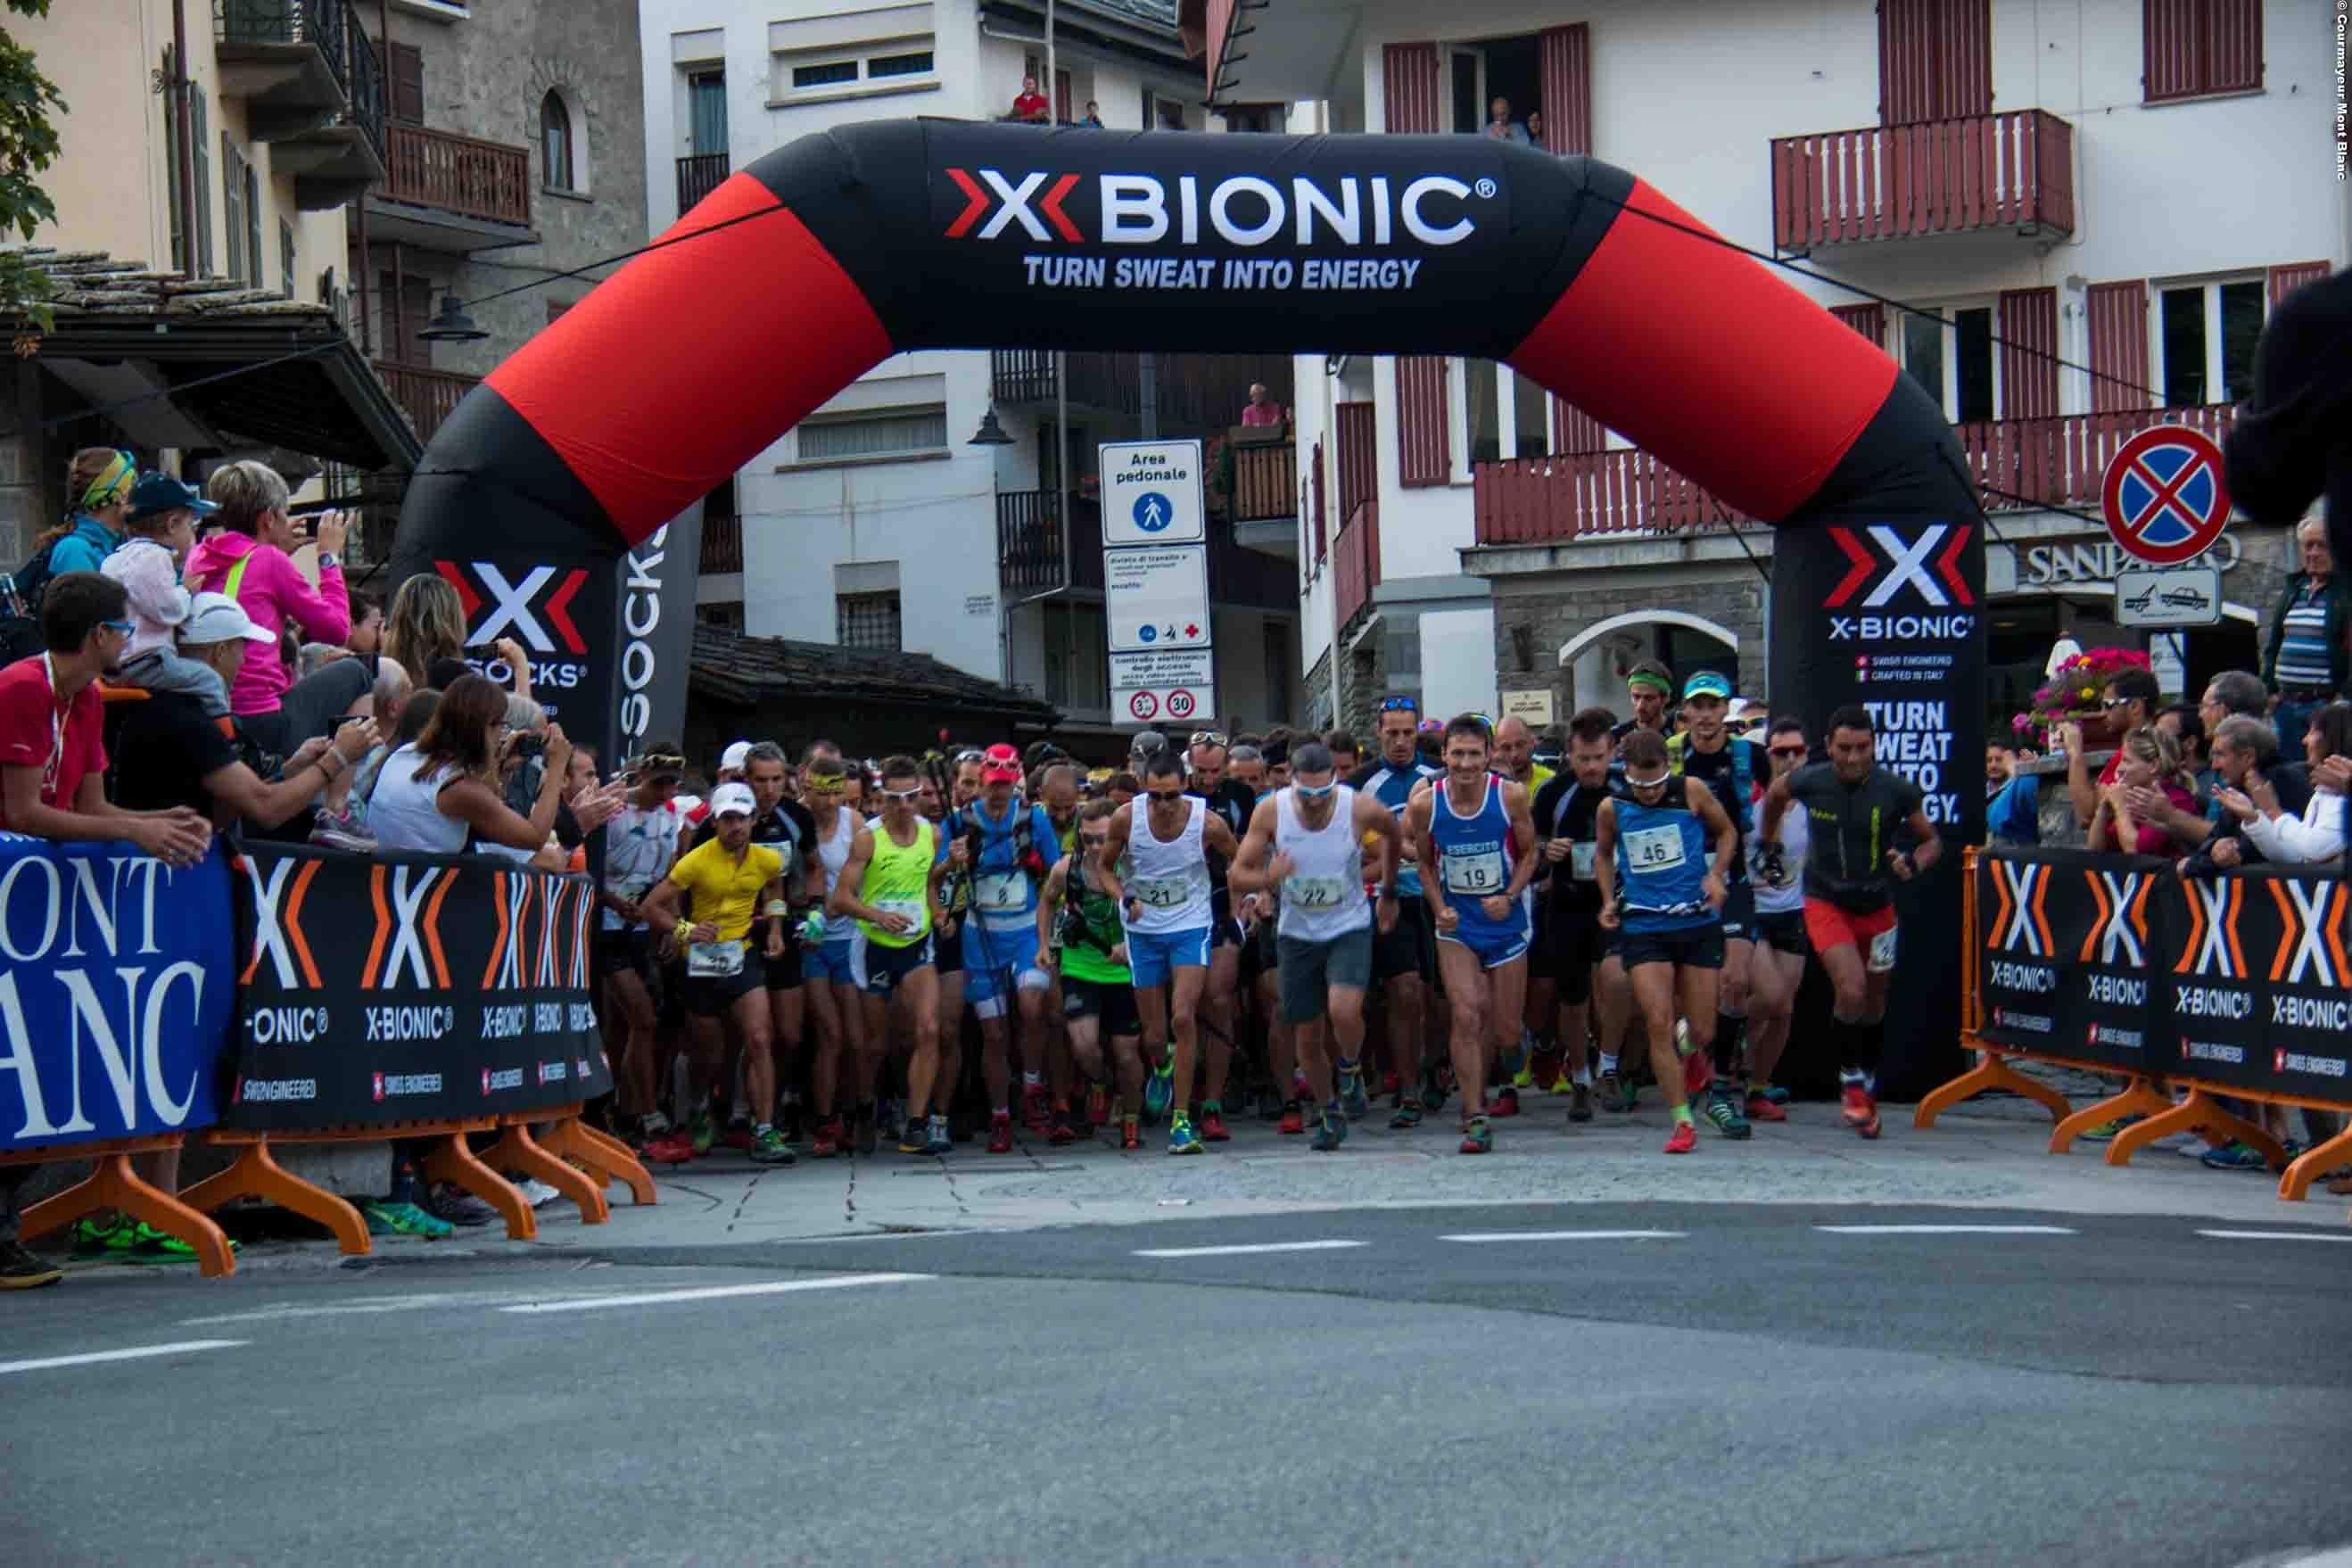 x bionic mont blanc